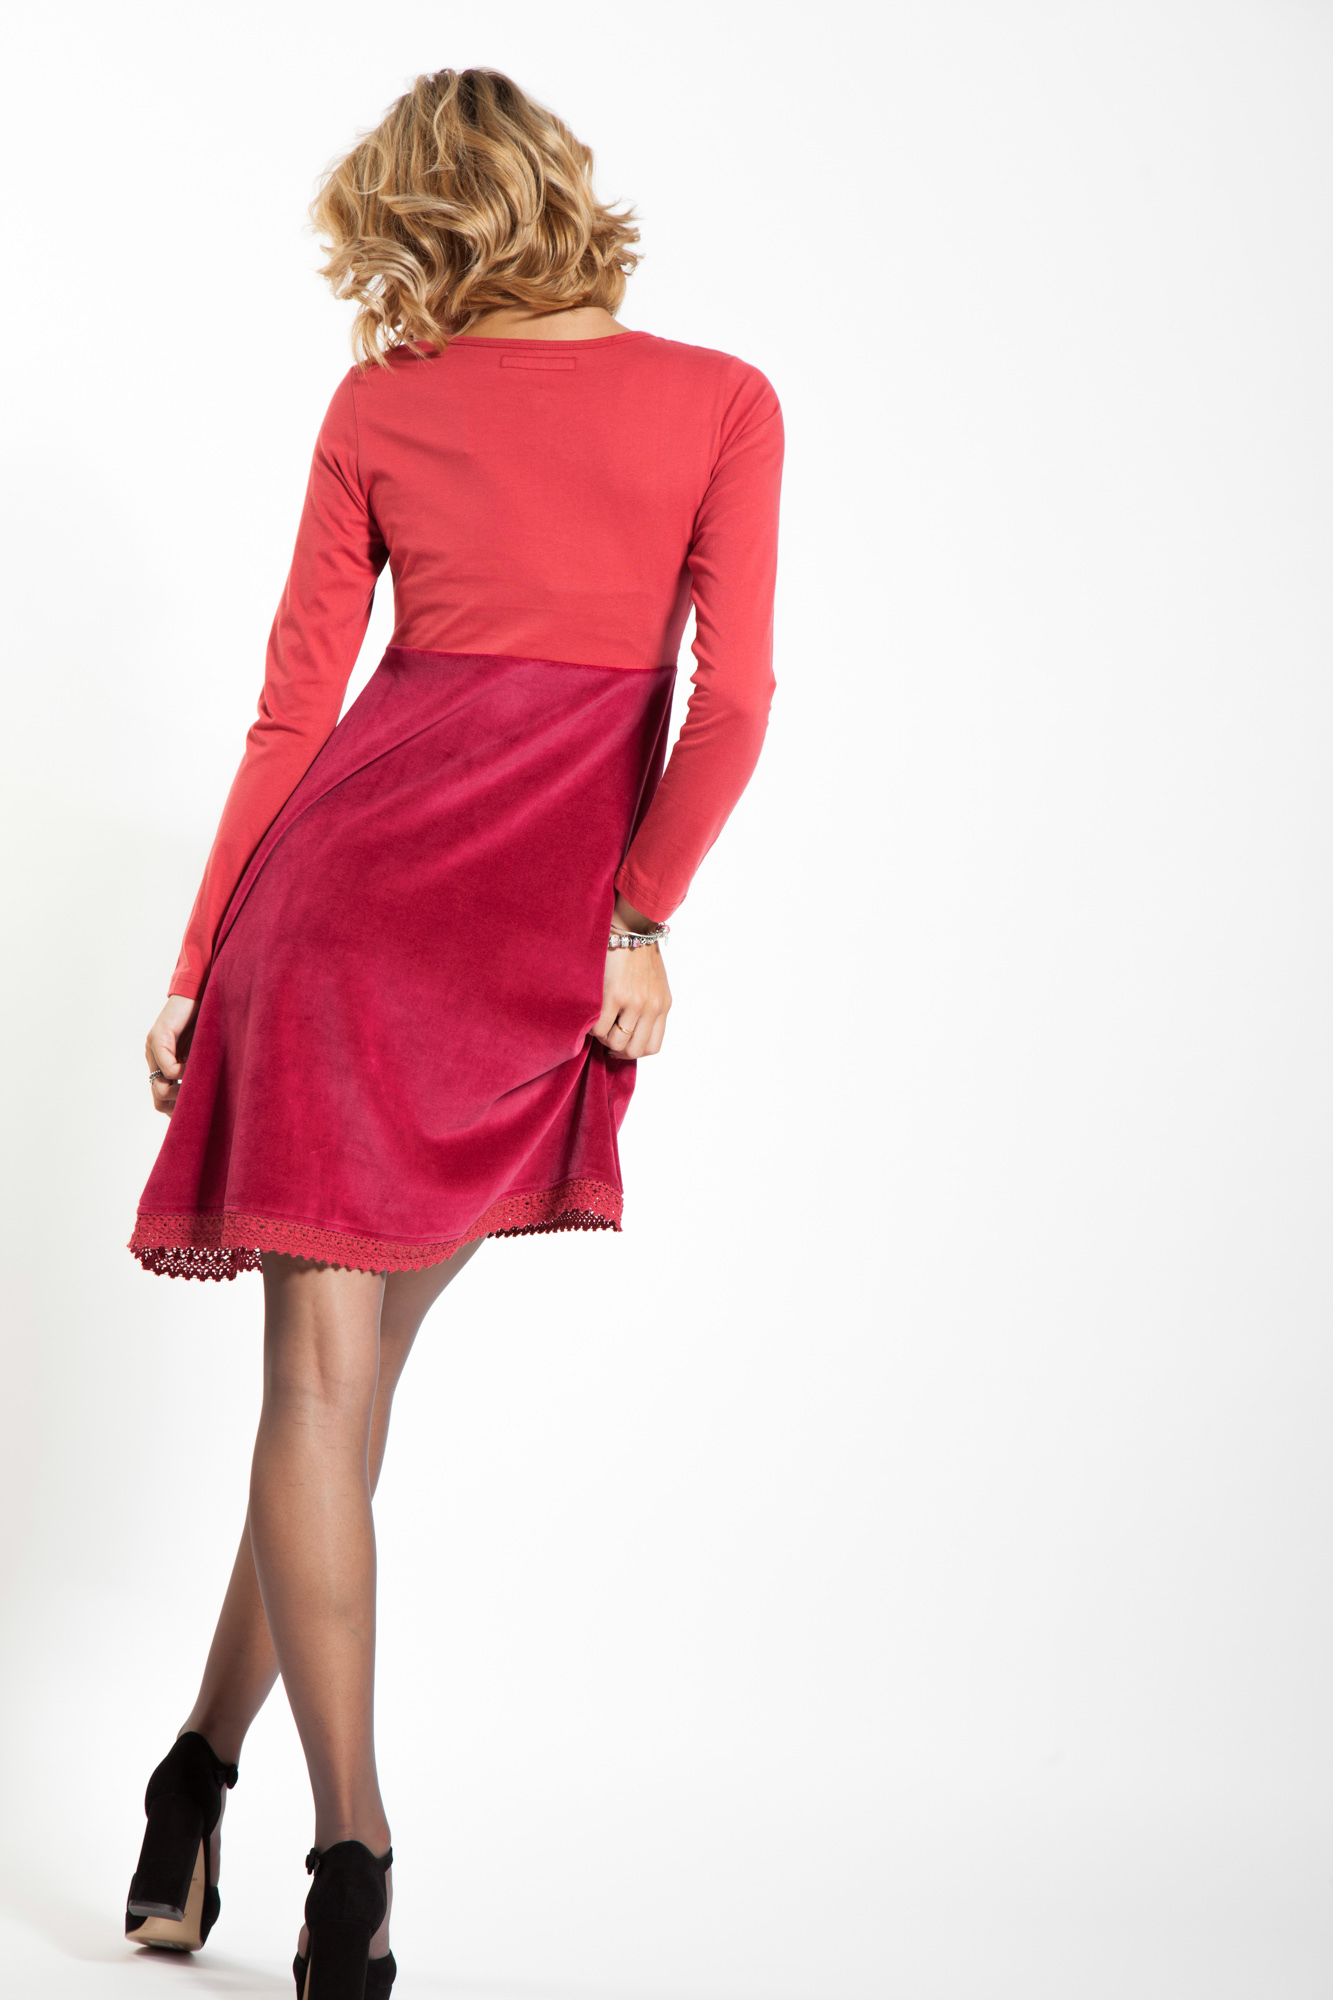 Rochie eleganta de catifea rosie cu broderie florala Sweetheart